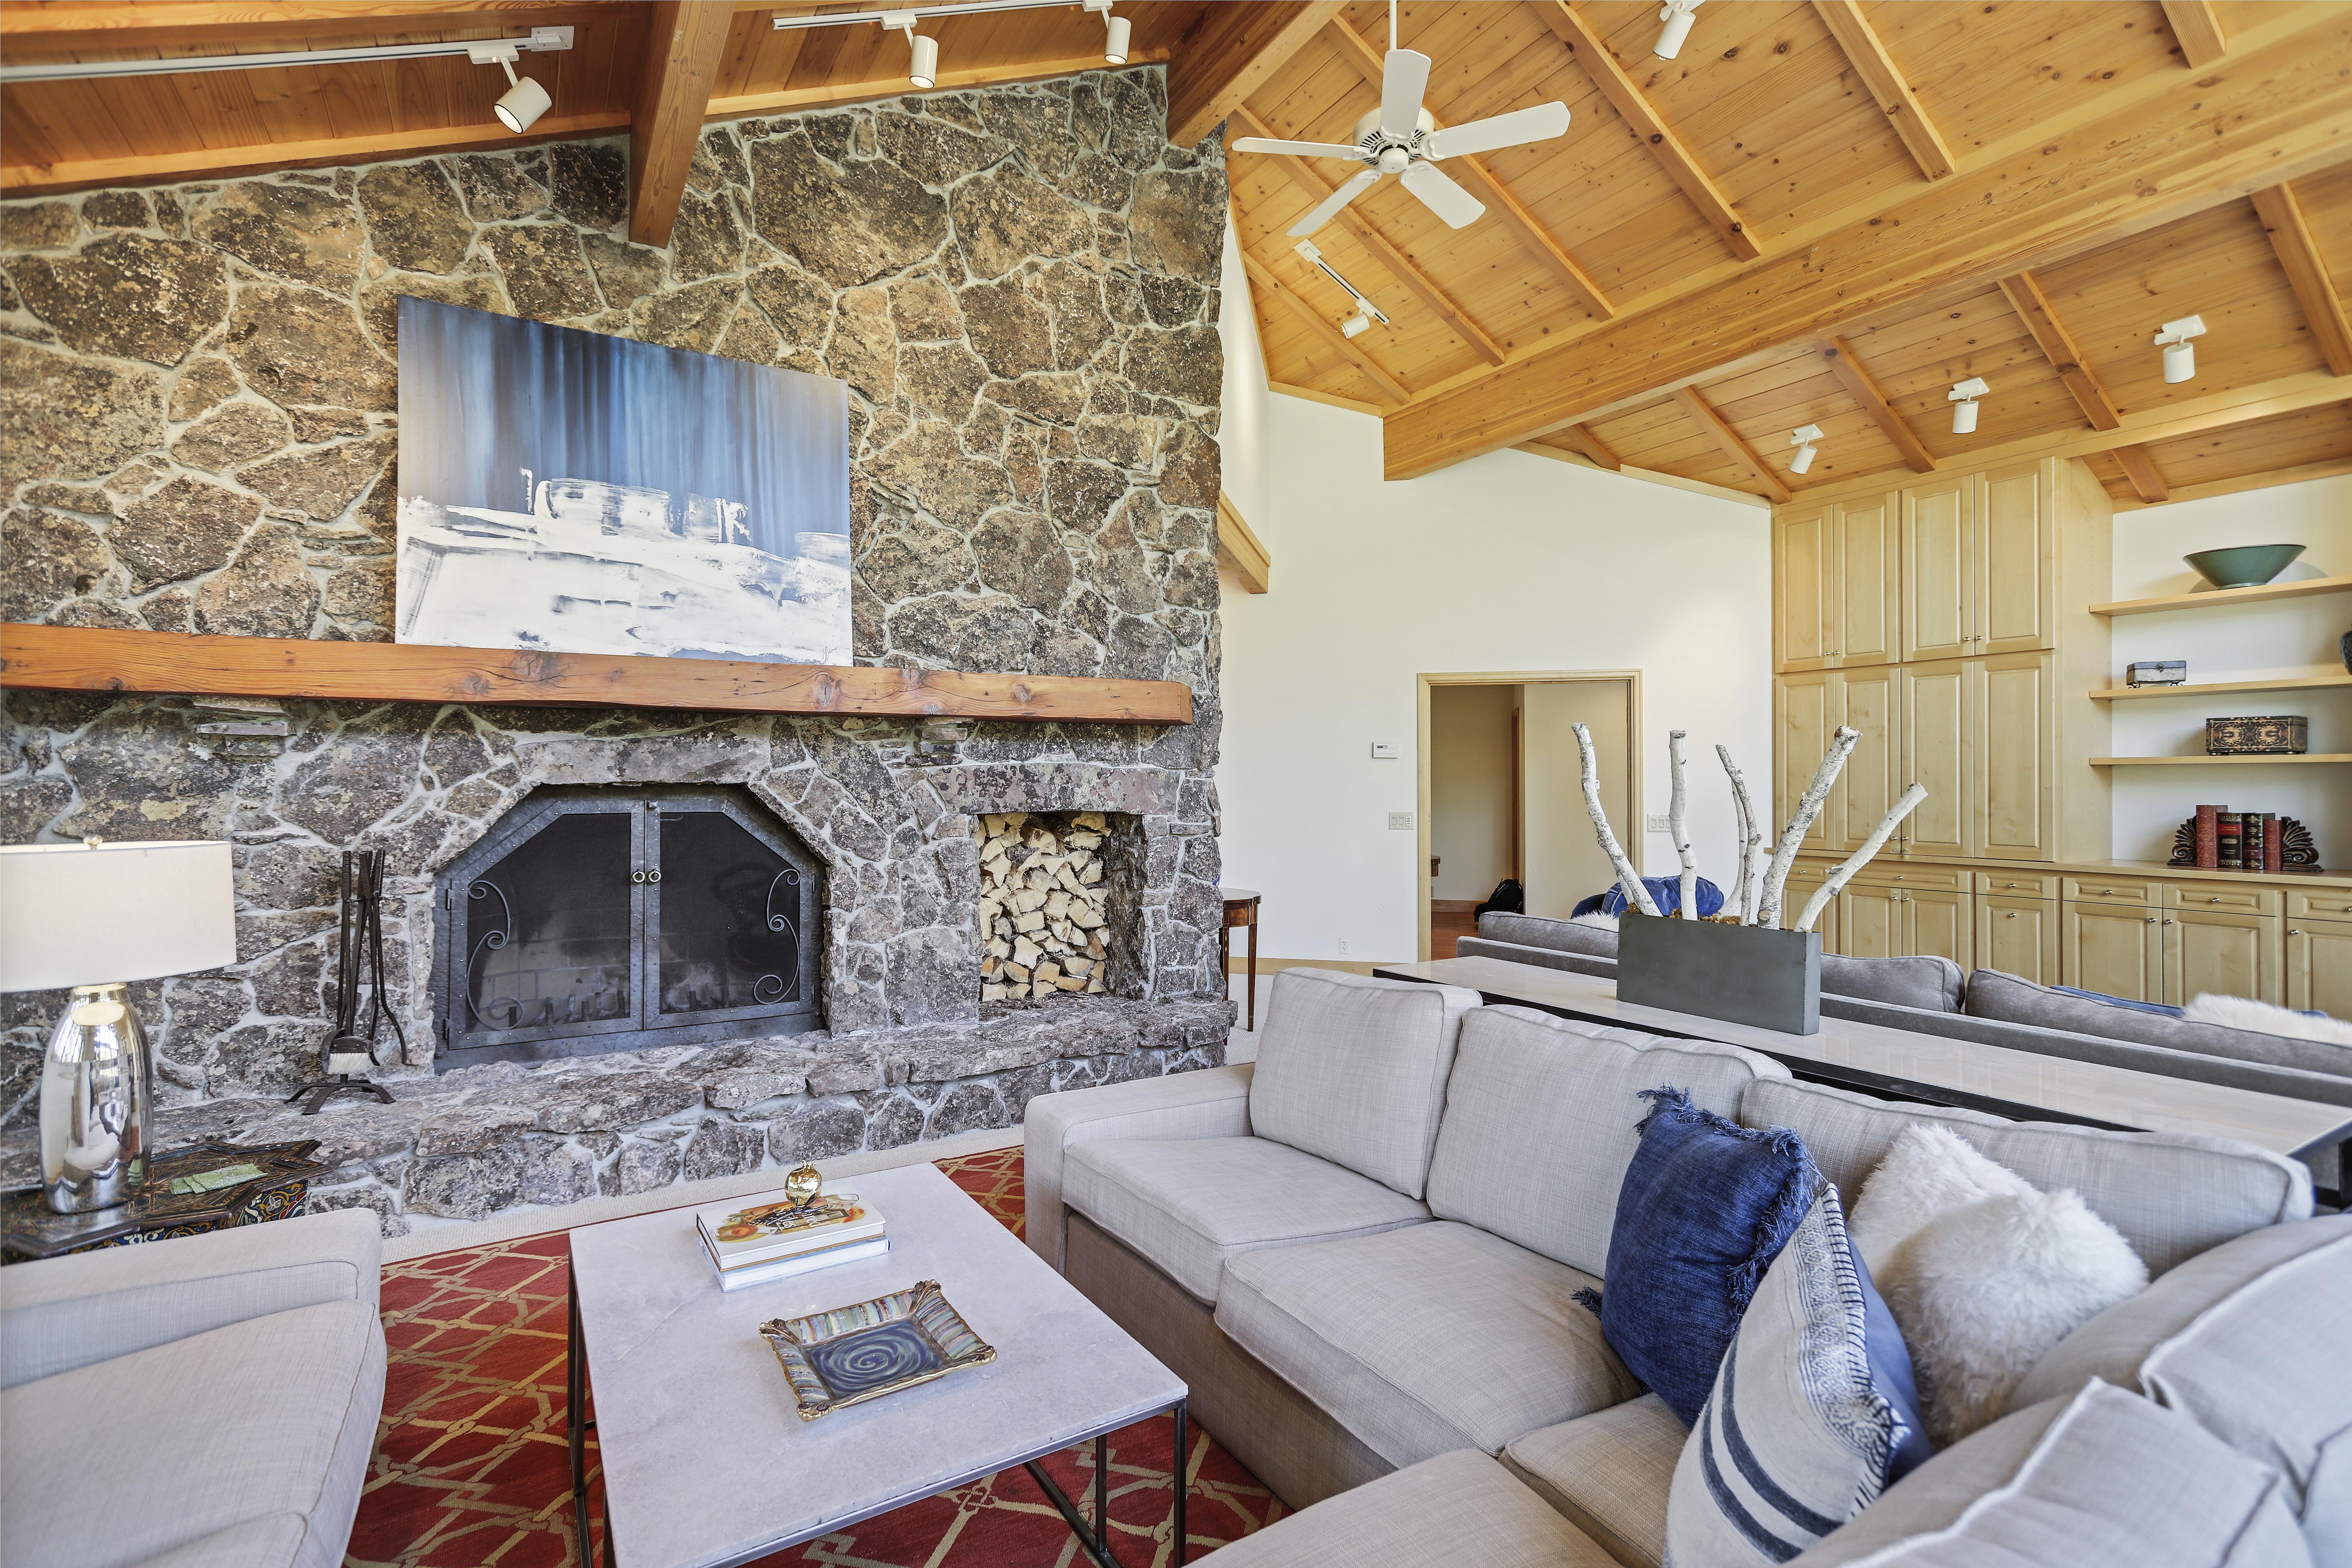 Abode-Luxury-Rentals-Jackson-Hole-Wyoming-Teton-Garden-Interior -Living-Room-1.10 & Abode-Luxury-Rentals-Jackson-Hole-Wyoming-Teton-Garden-Interior ...